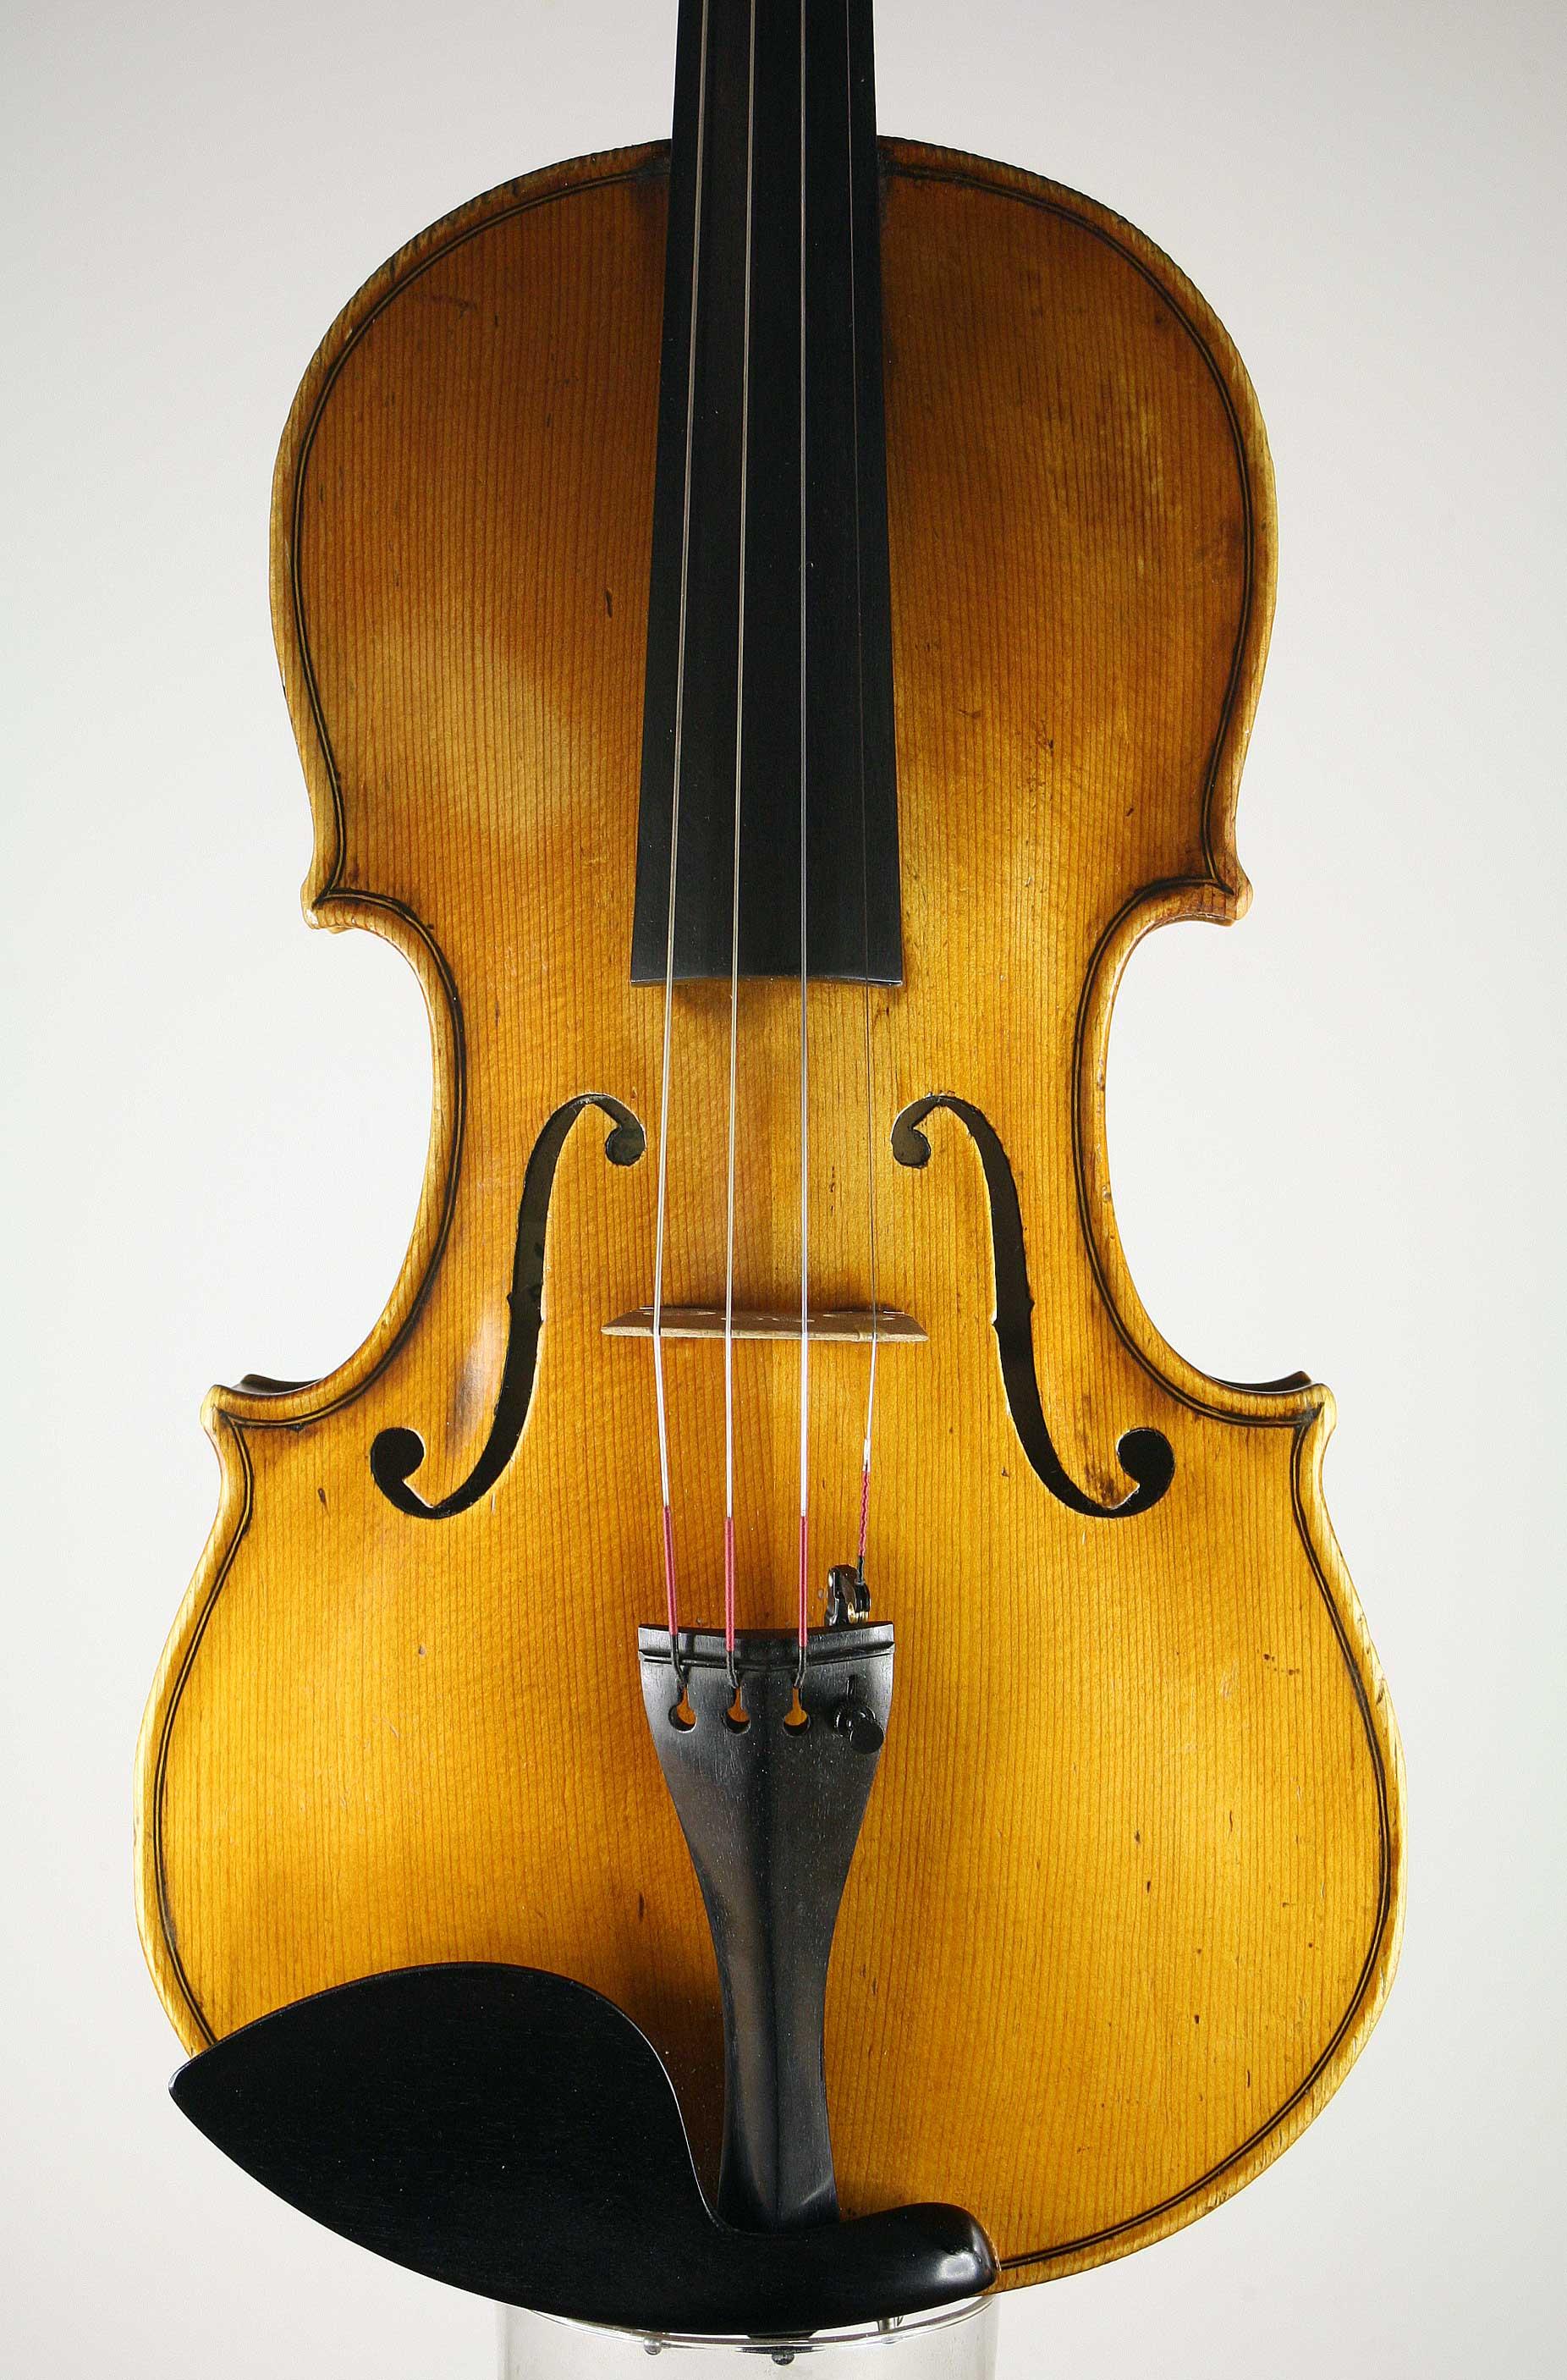 Antique Budapest Violin, 1966 | Martin Swan Violins